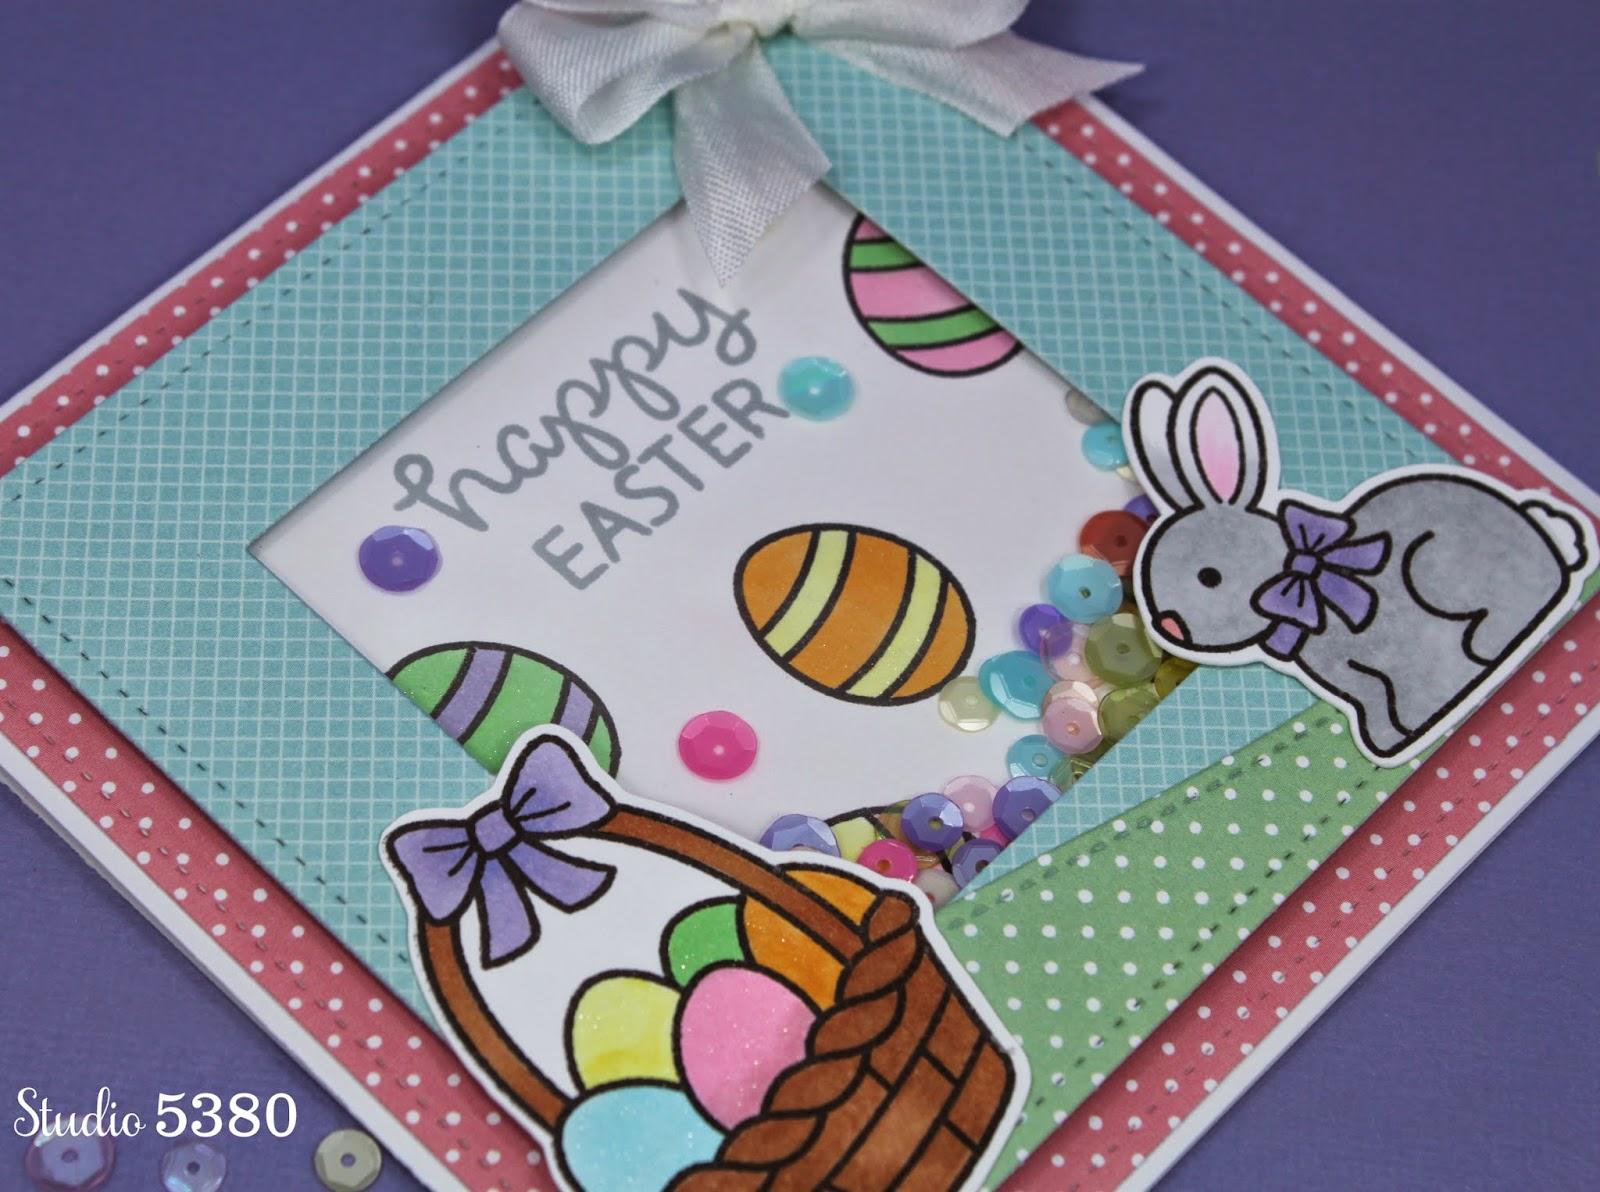 Studio 5380: Happy Easter